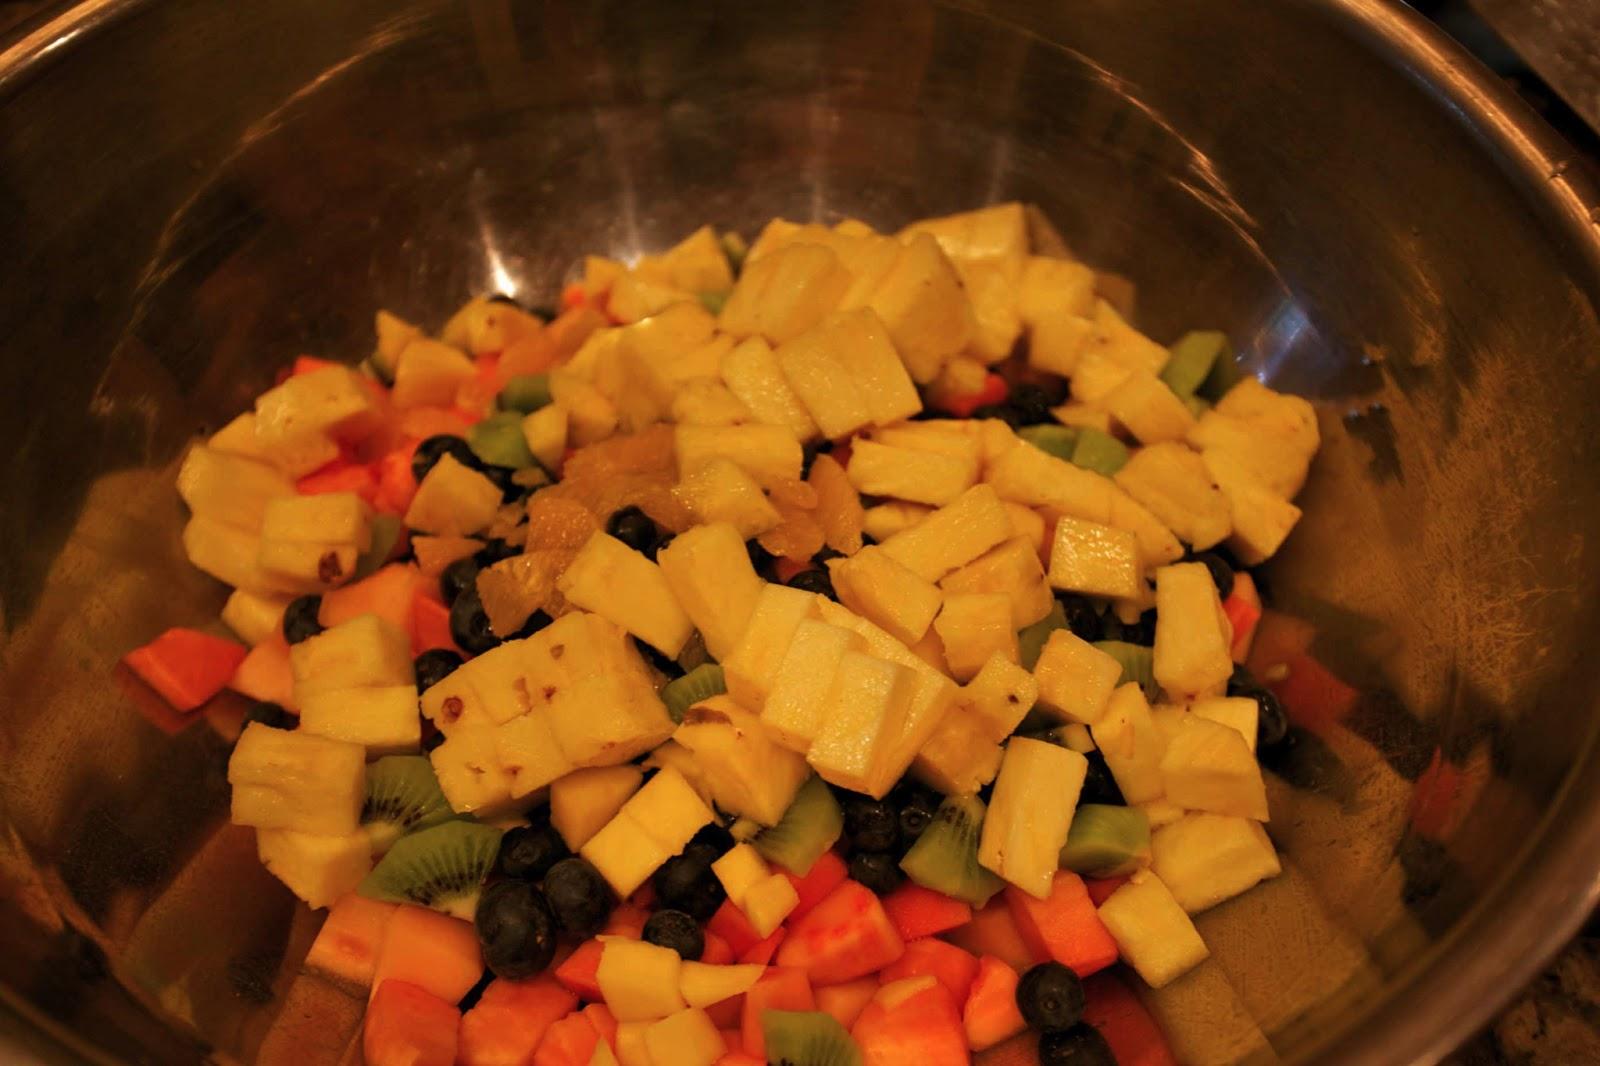 Octoberfarm: Fresh Fruit Salad with Honey Lime Mint Dressing